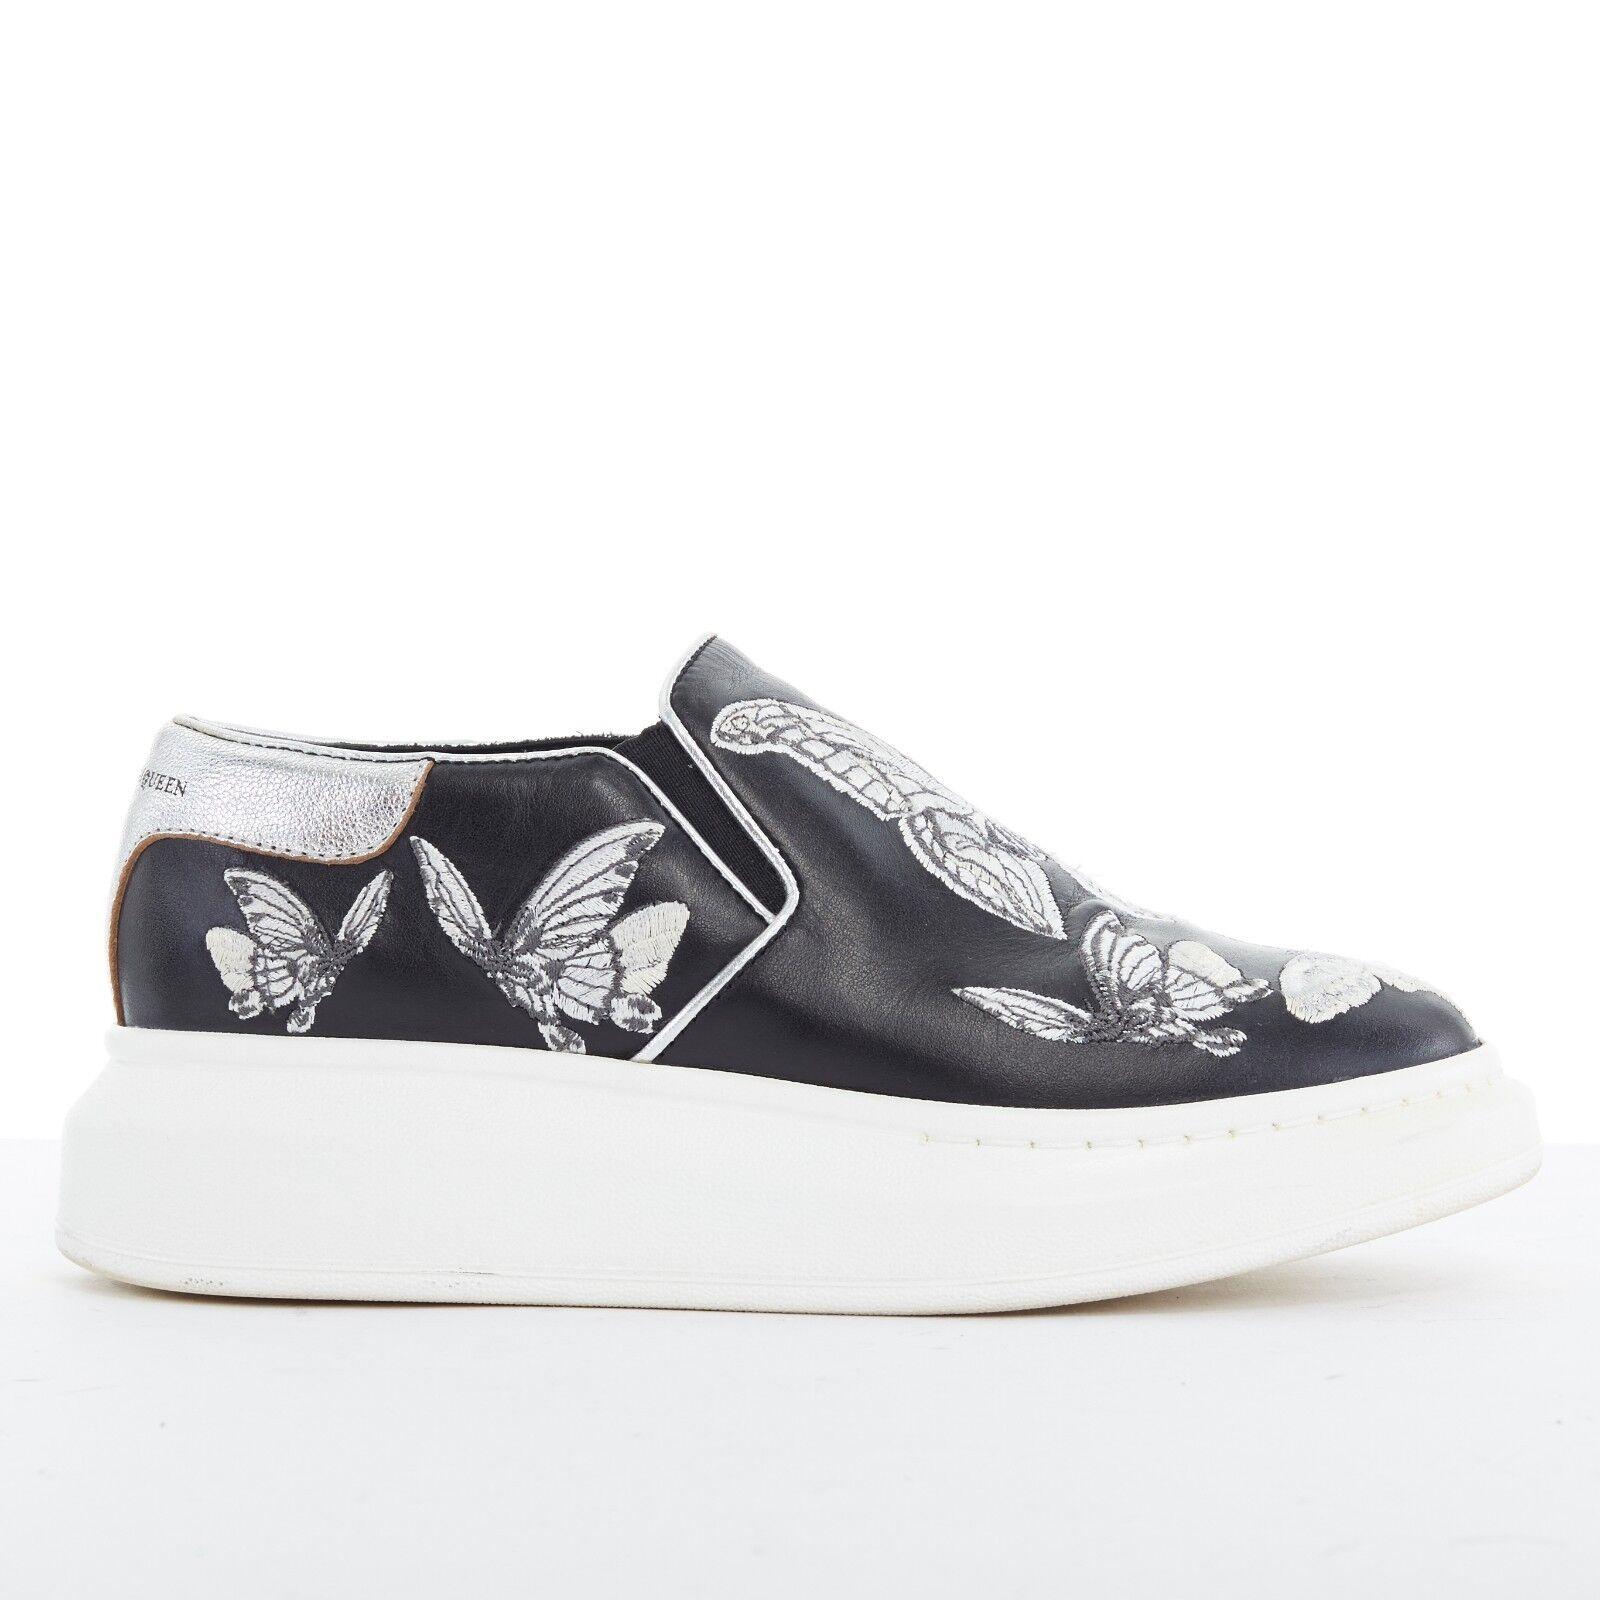 ALEXANDER MCQUEEN butterfly embroidery black leather platform sneaker EU36.5